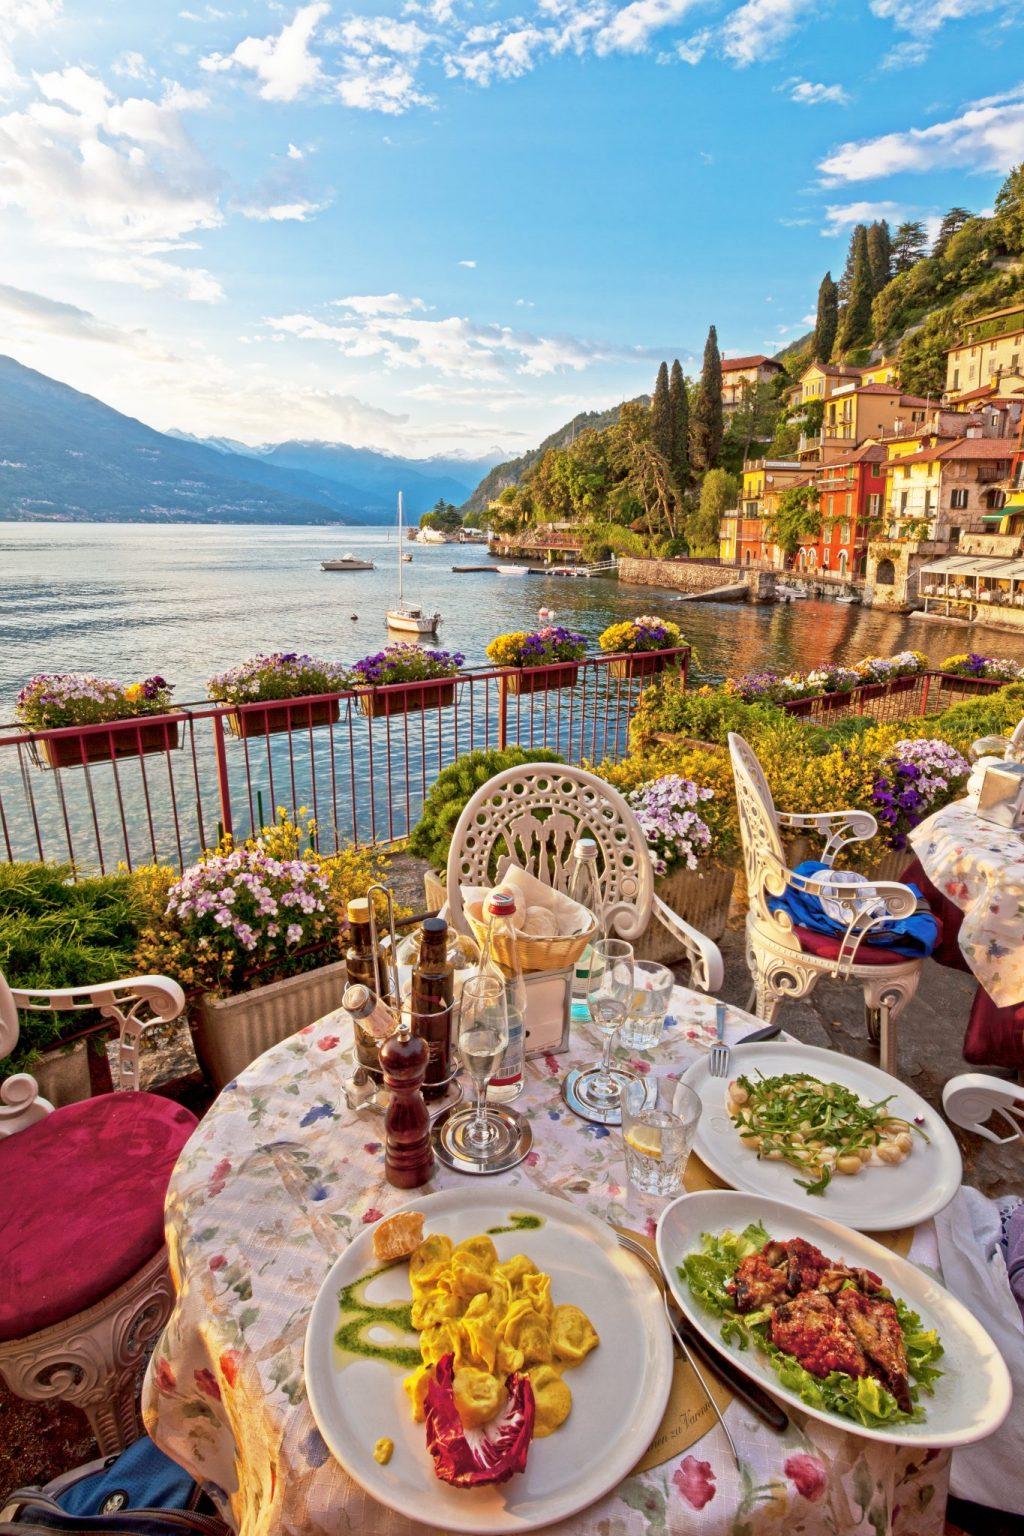 European bucket list destination: Lake Como in Italy